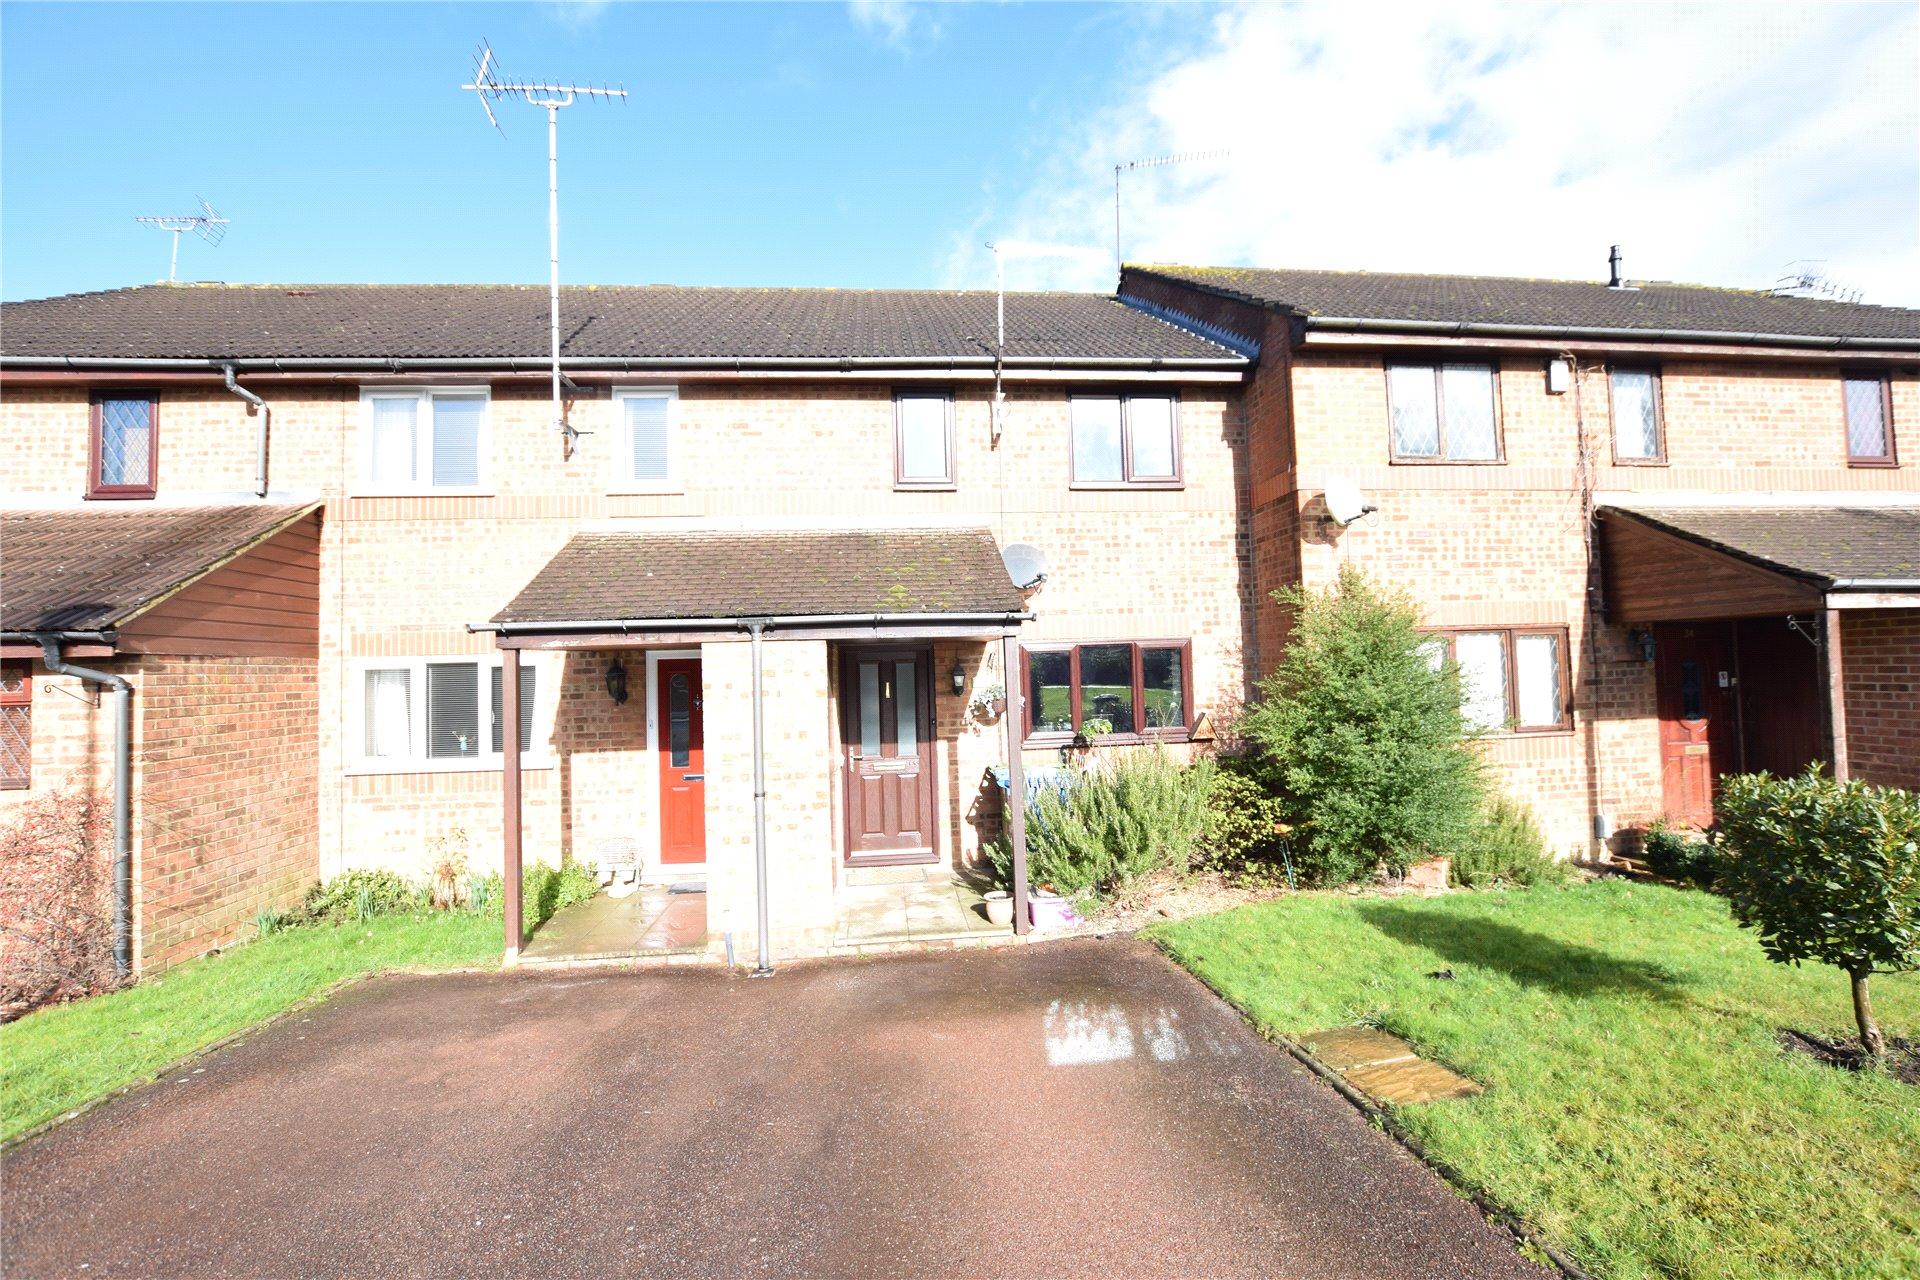 3 Bedrooms Terraced House for sale in Chesterblade Lane, Bracknell, Berkshire, RG12